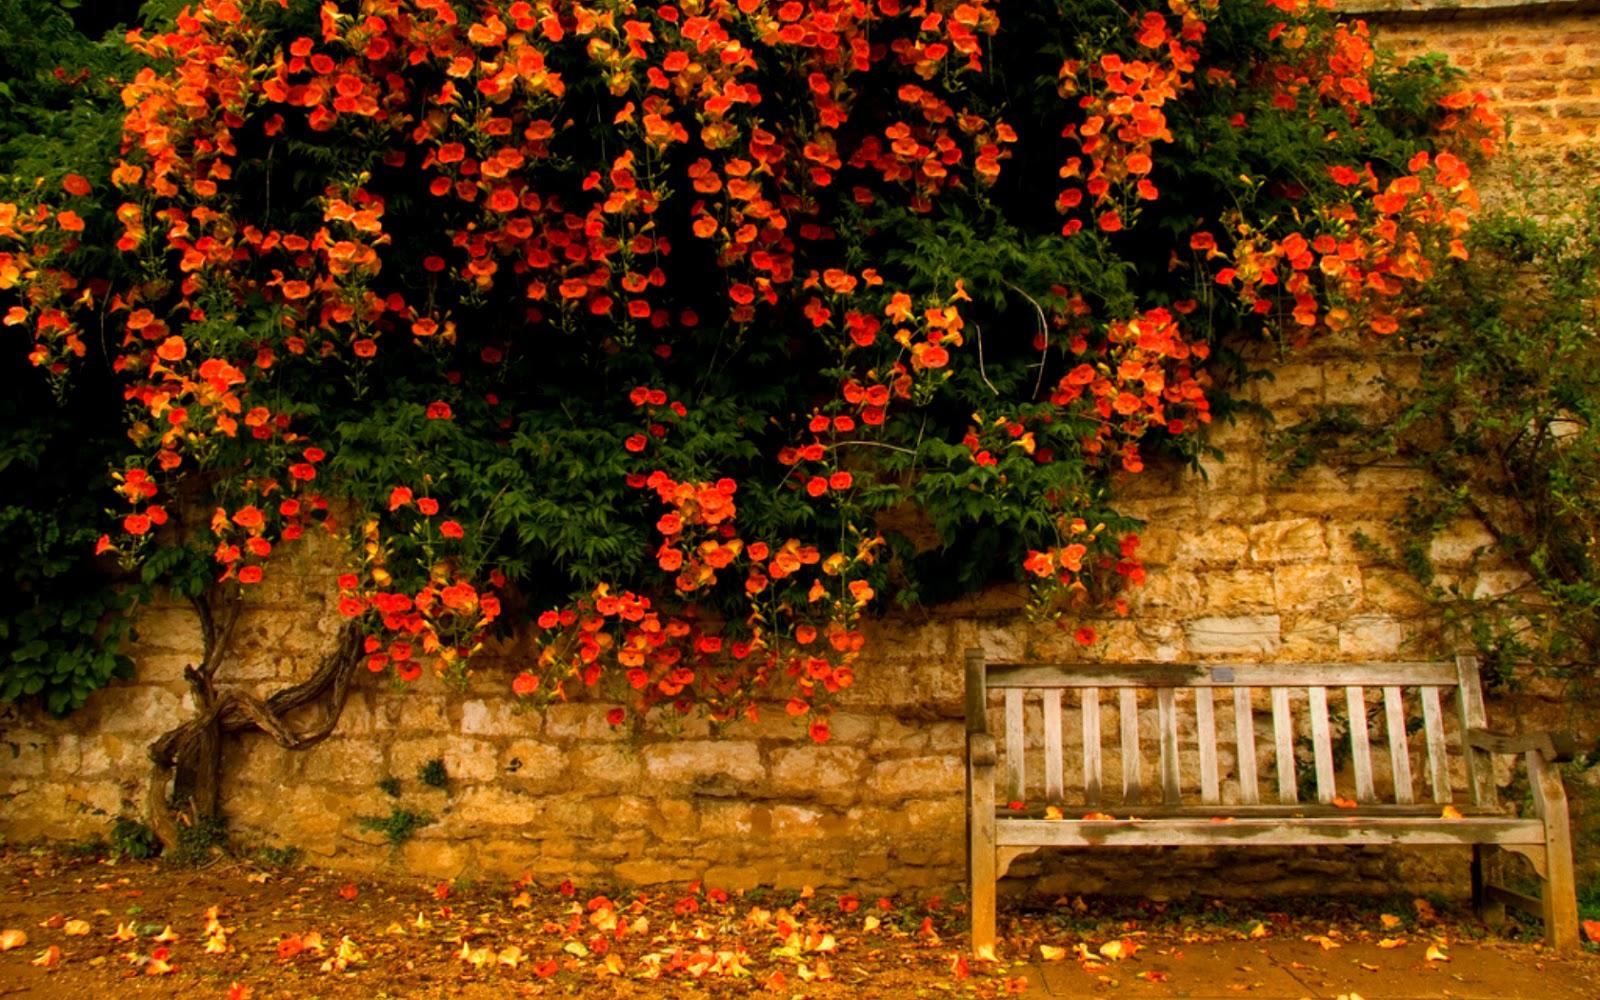 Fall Leaves Hd Wallpapers 1080p Das Leben Ist Bunt Der Herbst Ist Da